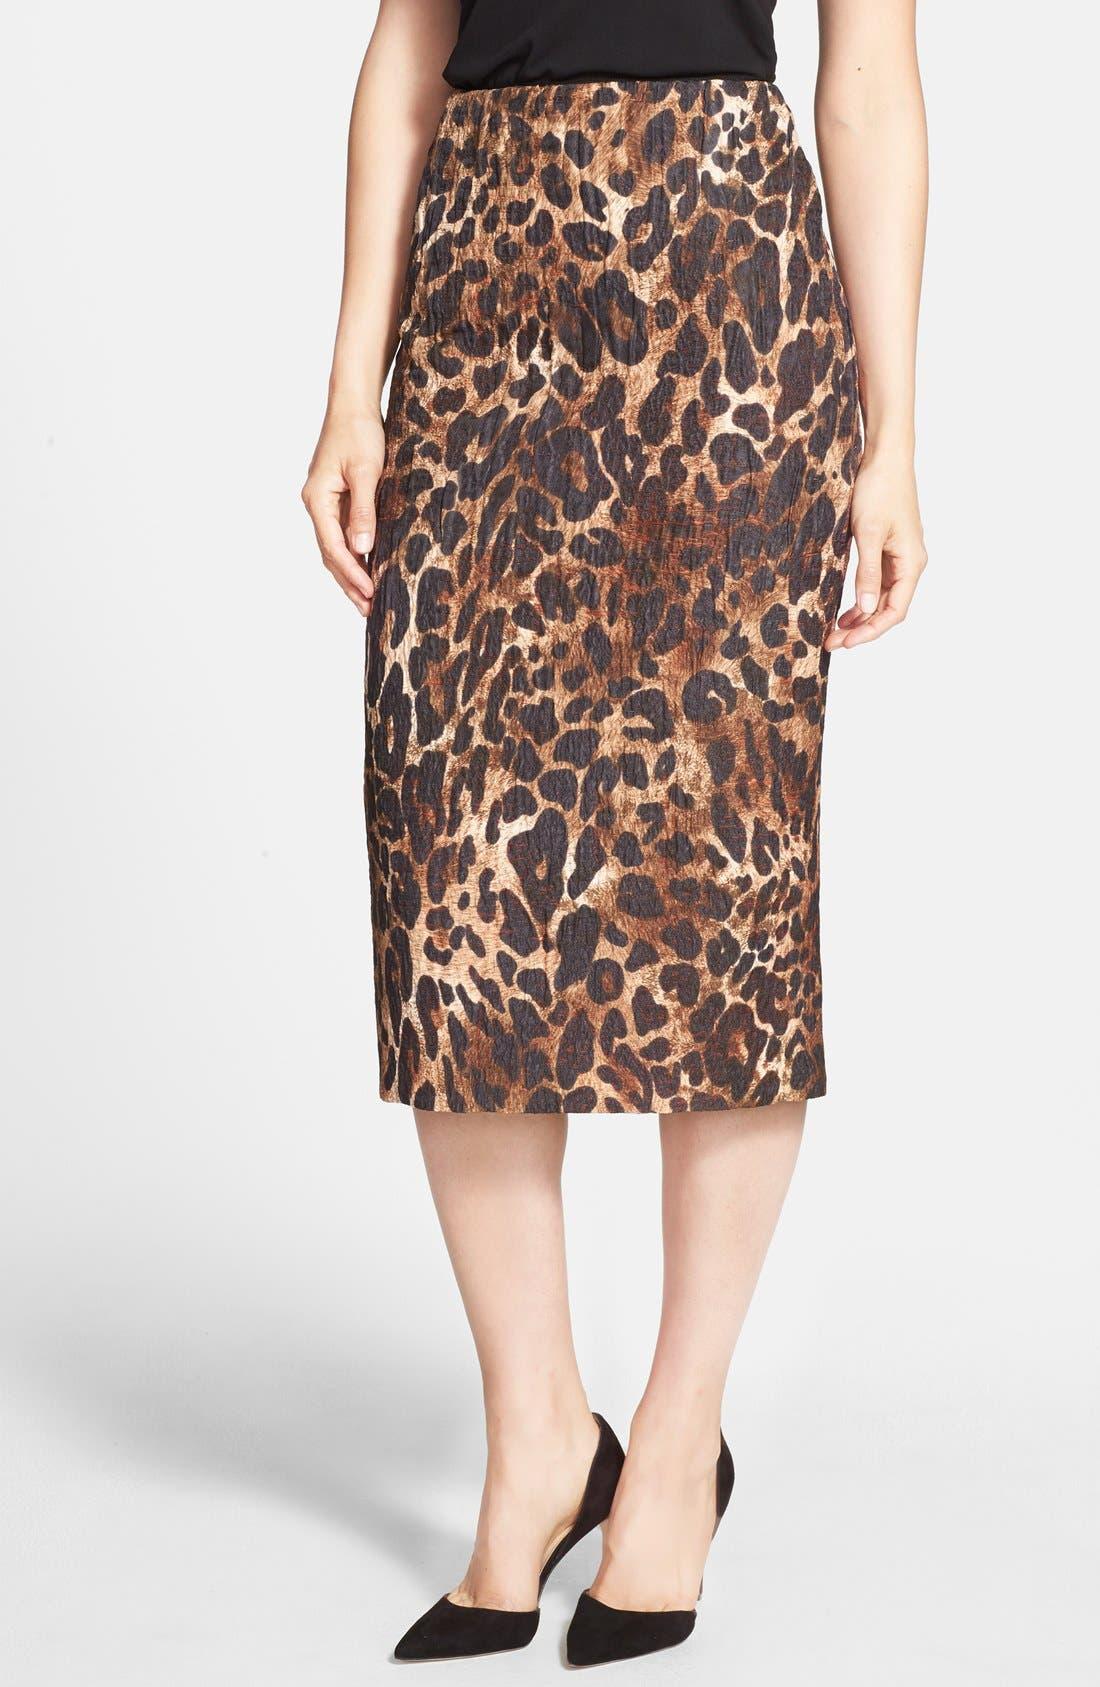 Alternate Image 1 Selected - Lafayette 148 New York 'Priscilla' Leopard Print Midi Skirt